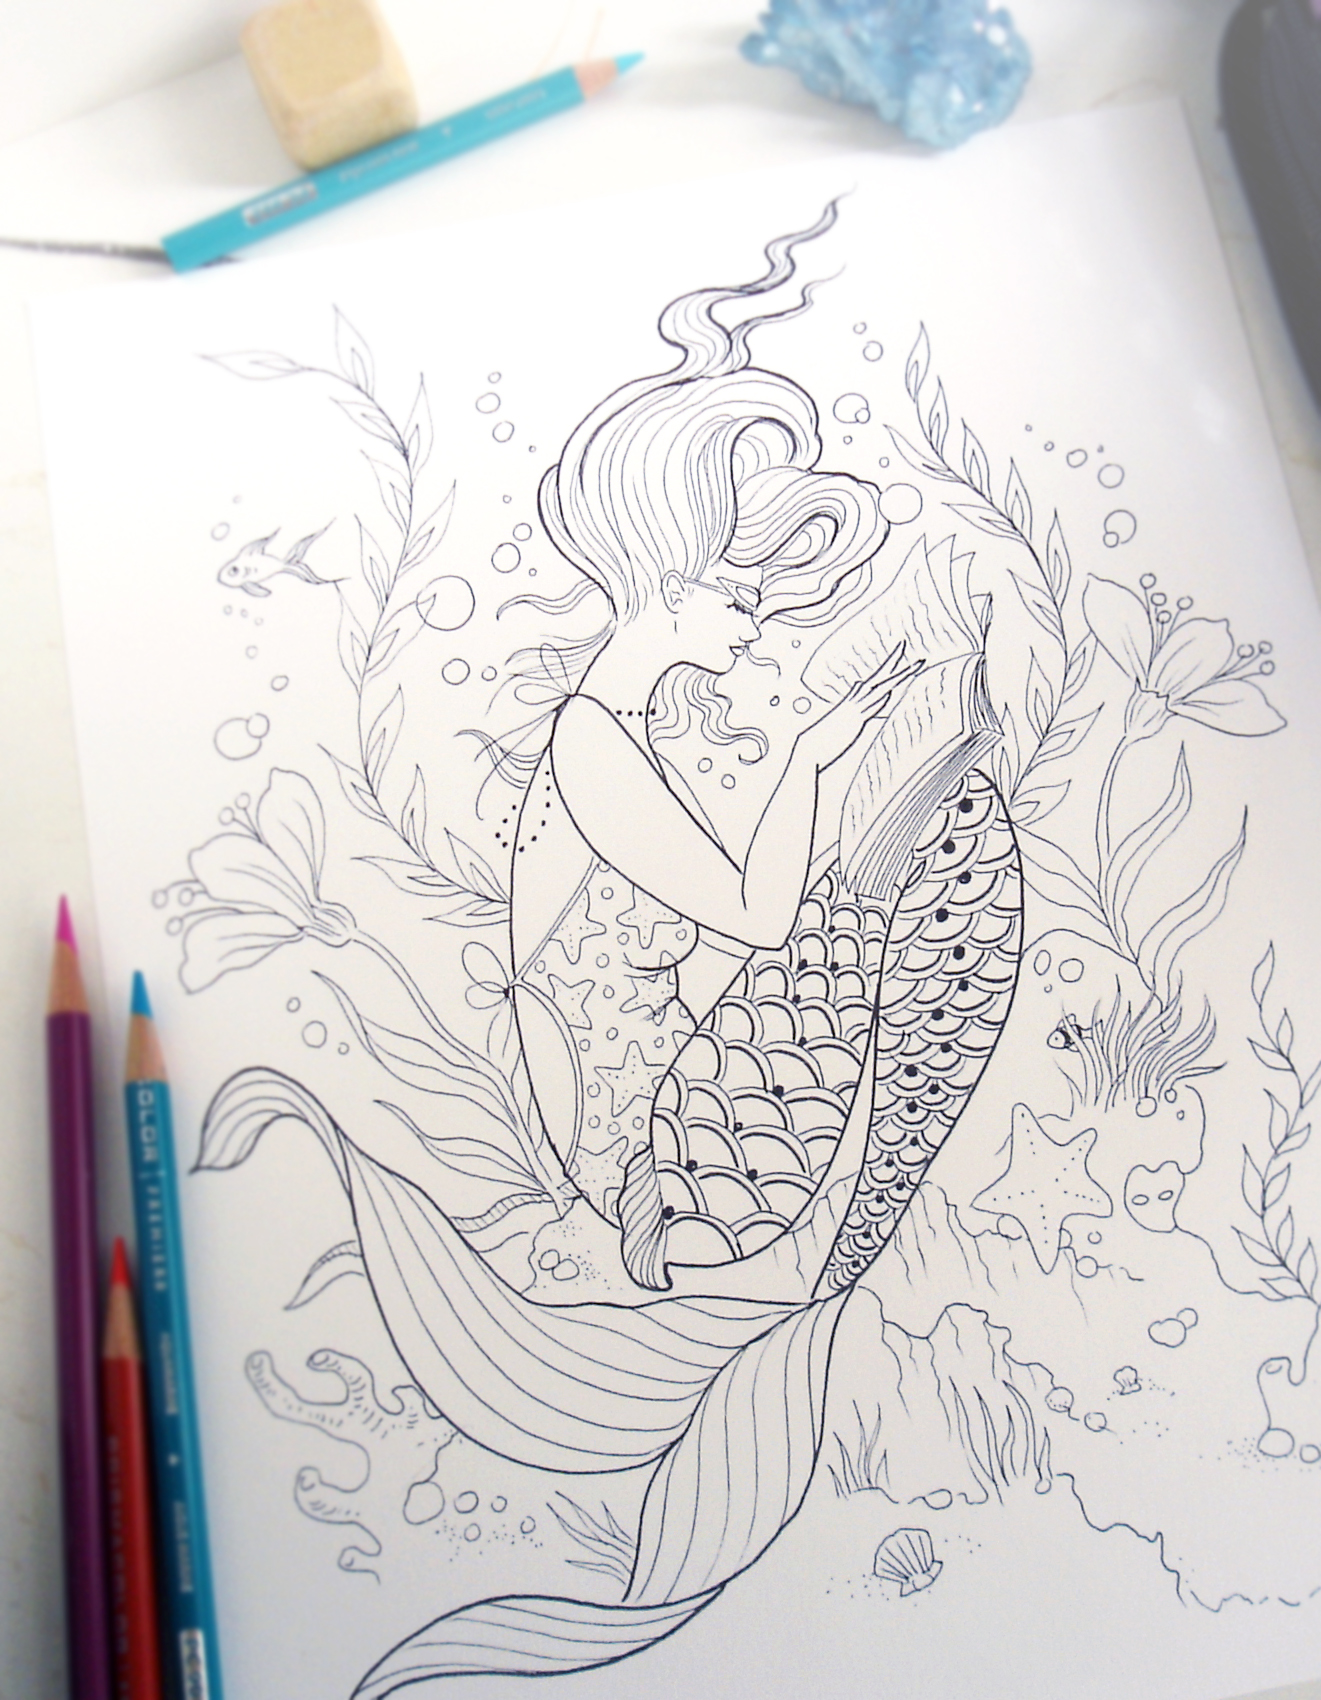 mermaidpreview.jpg